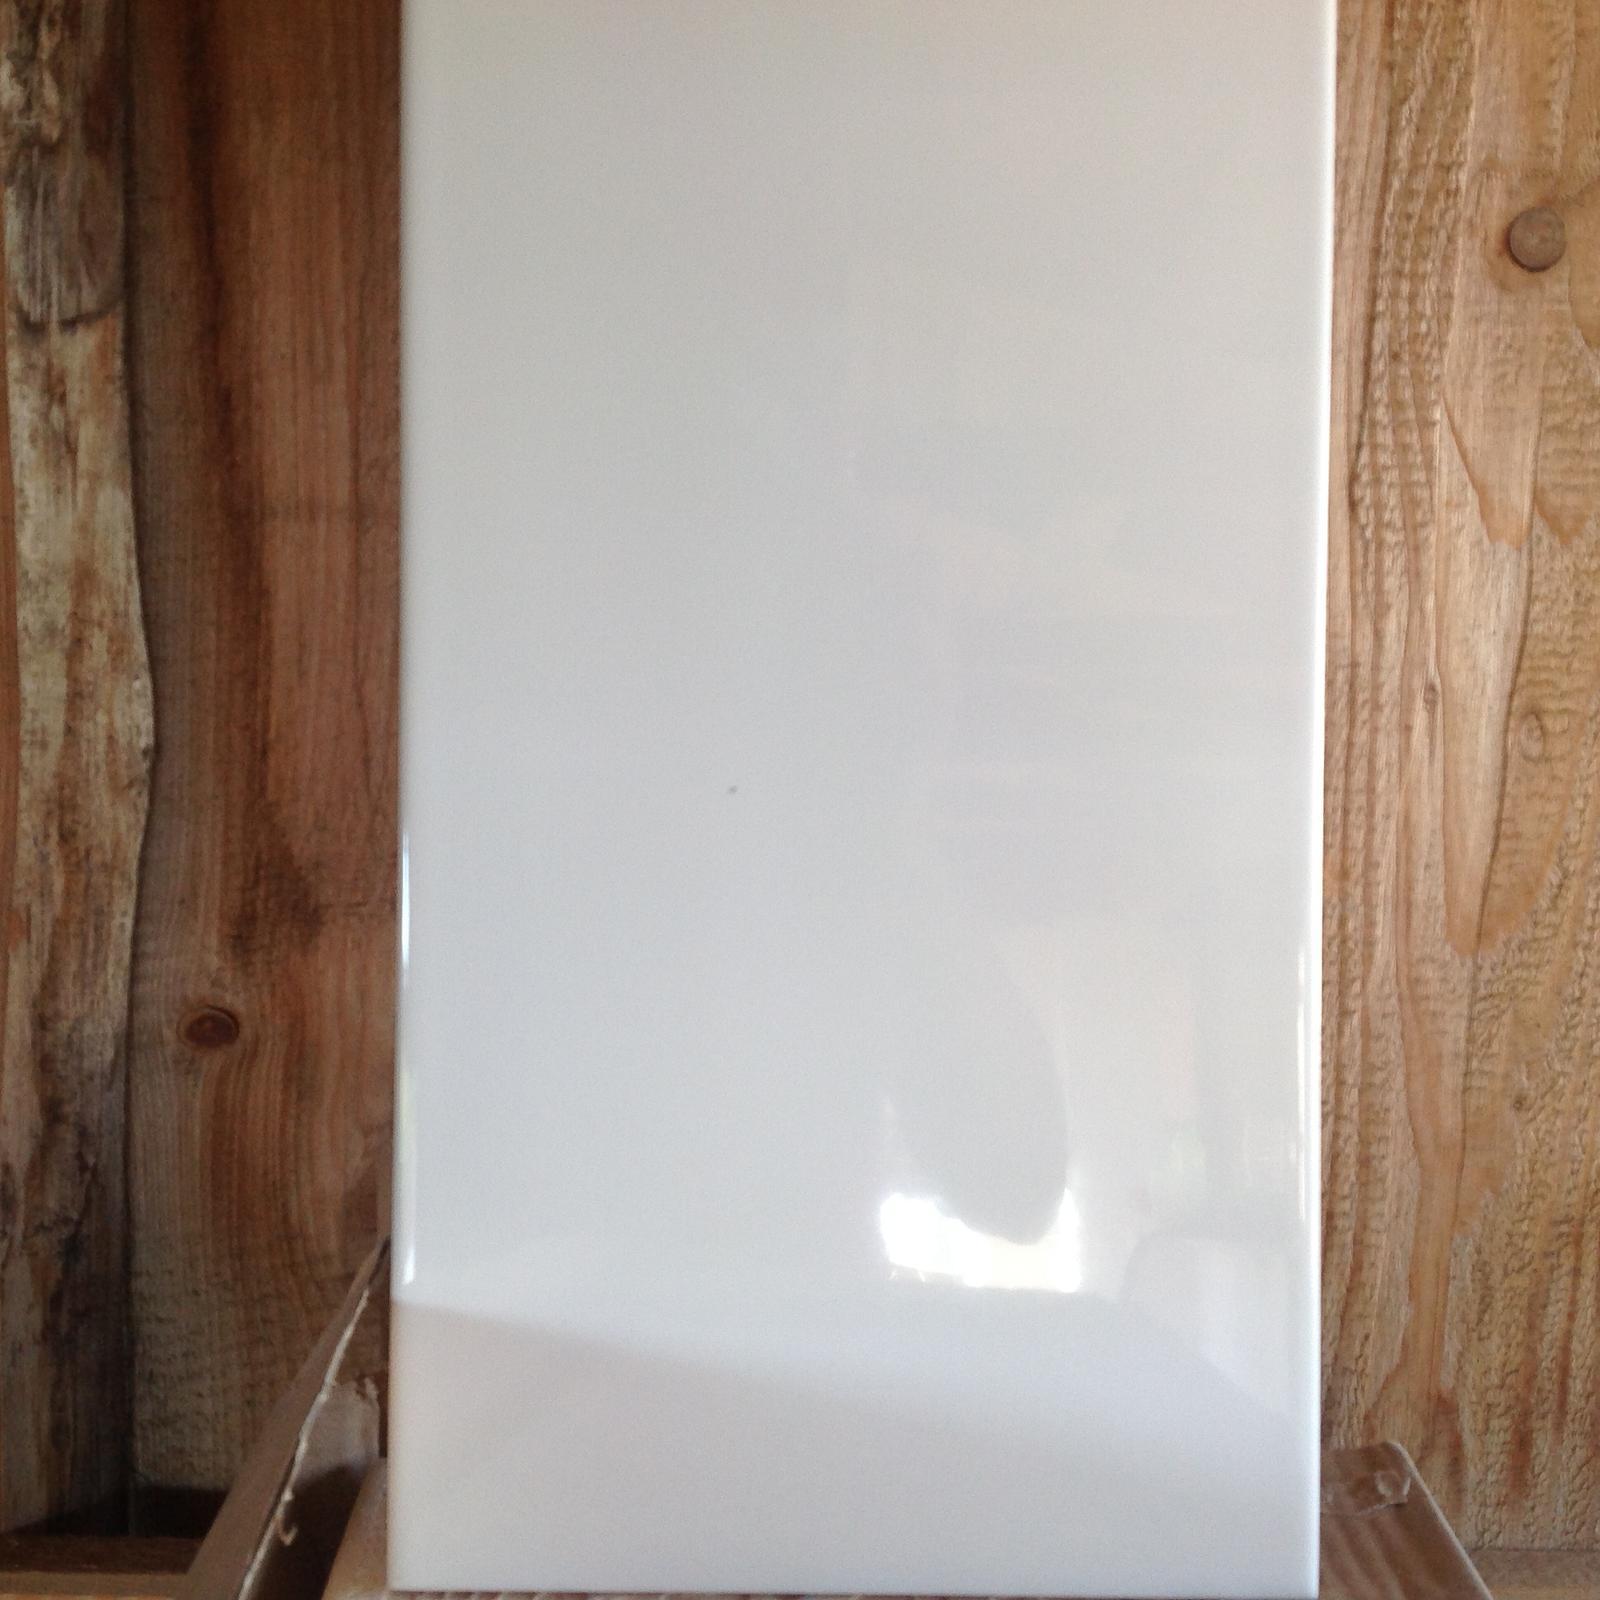 Vysokoleskly obklad Abrila Bianco 20x60cm biela  - Obrázok č. 2